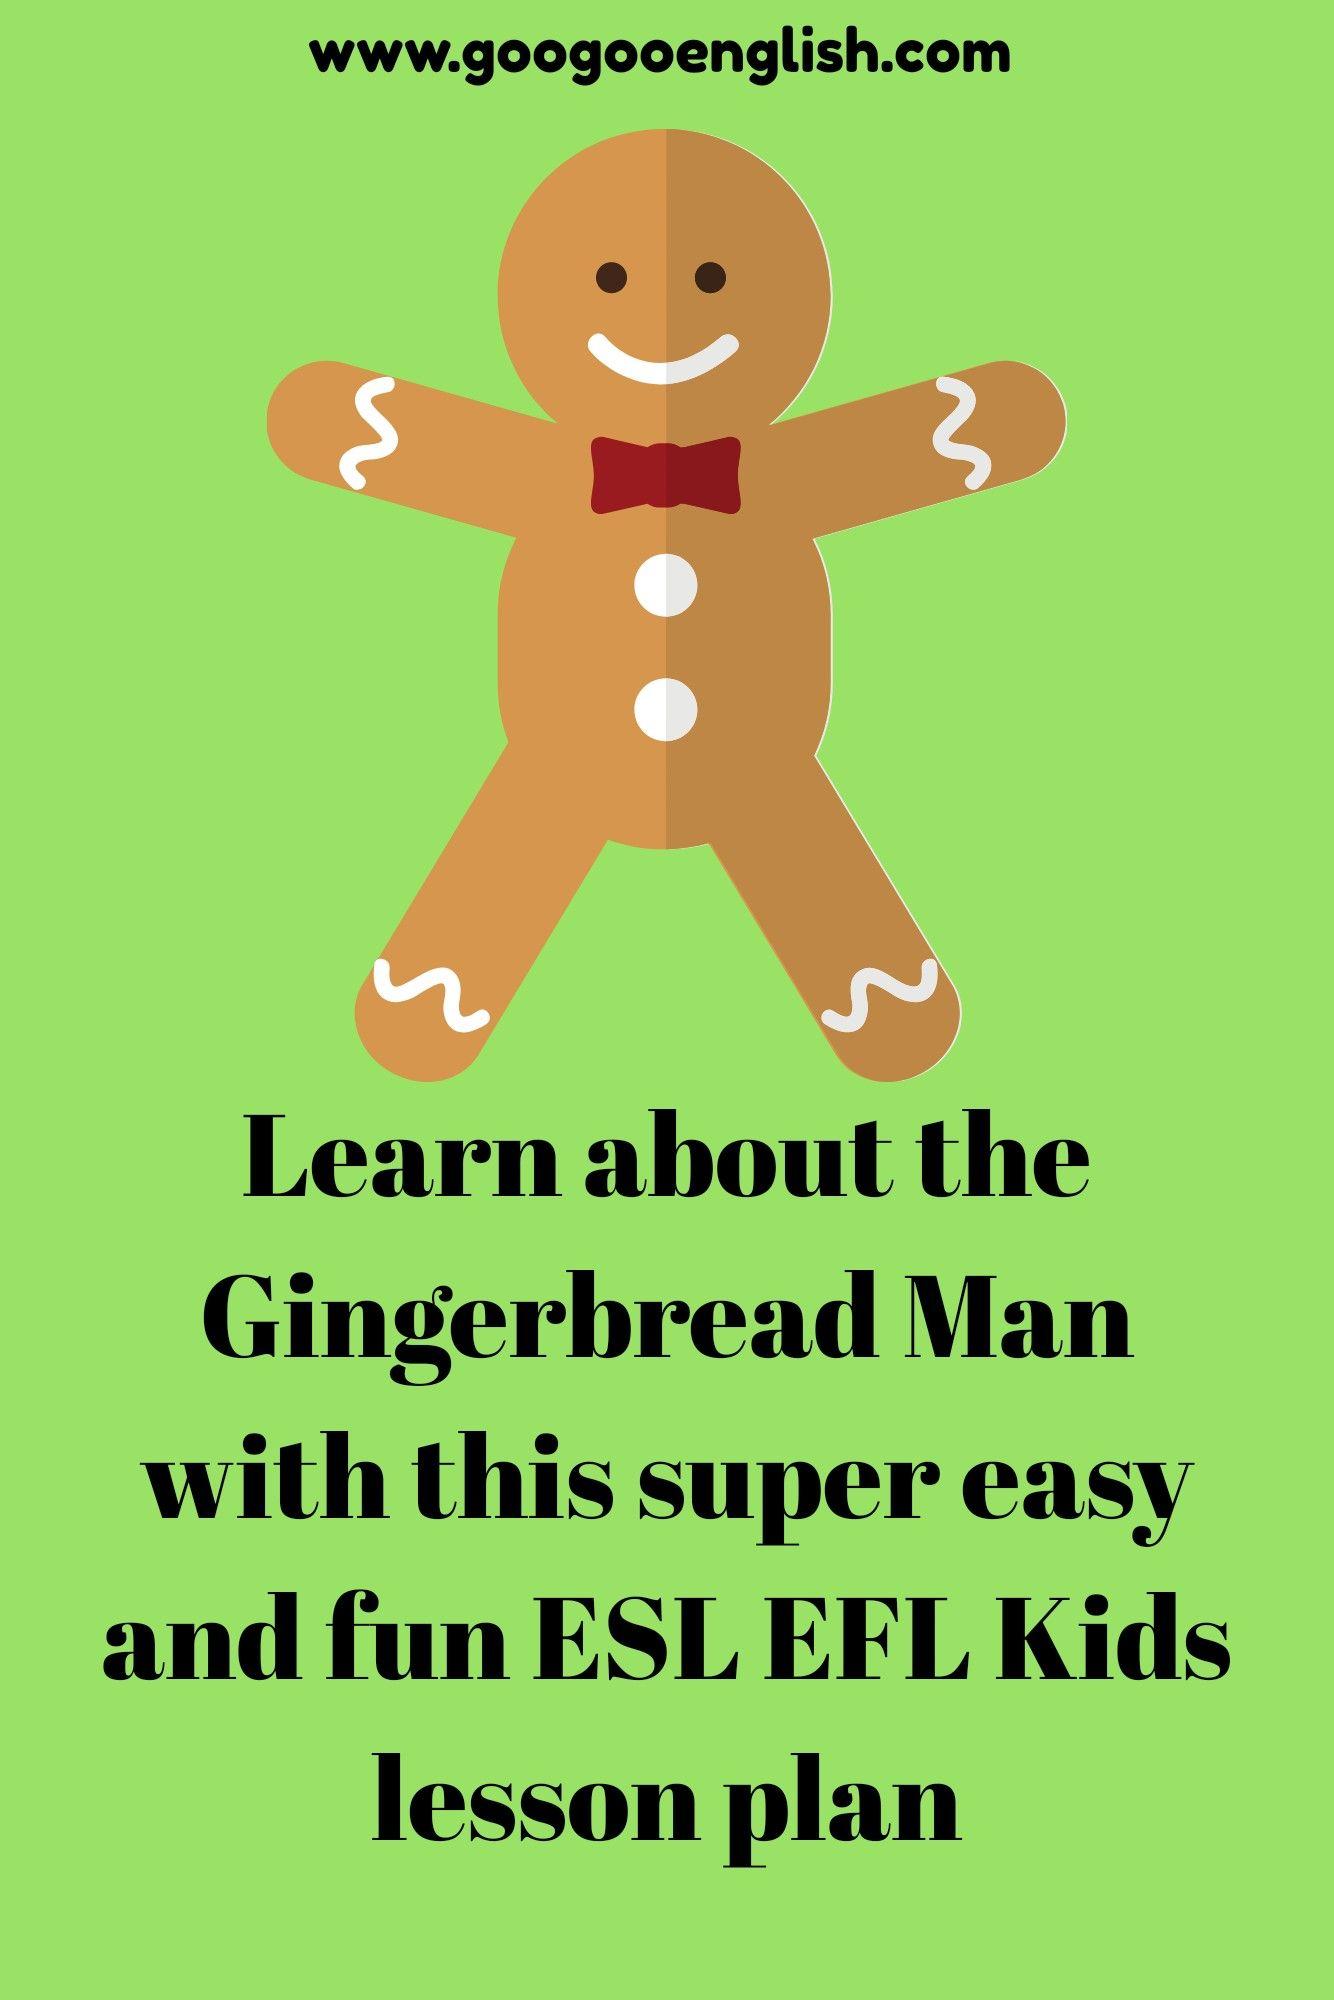 Esl Efl Kids Fun Gingerbread Man Lesson Plan For English Classes For Children Esl Lessons Teaching Lessons Plans Esl Lesson Plans [ 2000 x 1334 Pixel ]